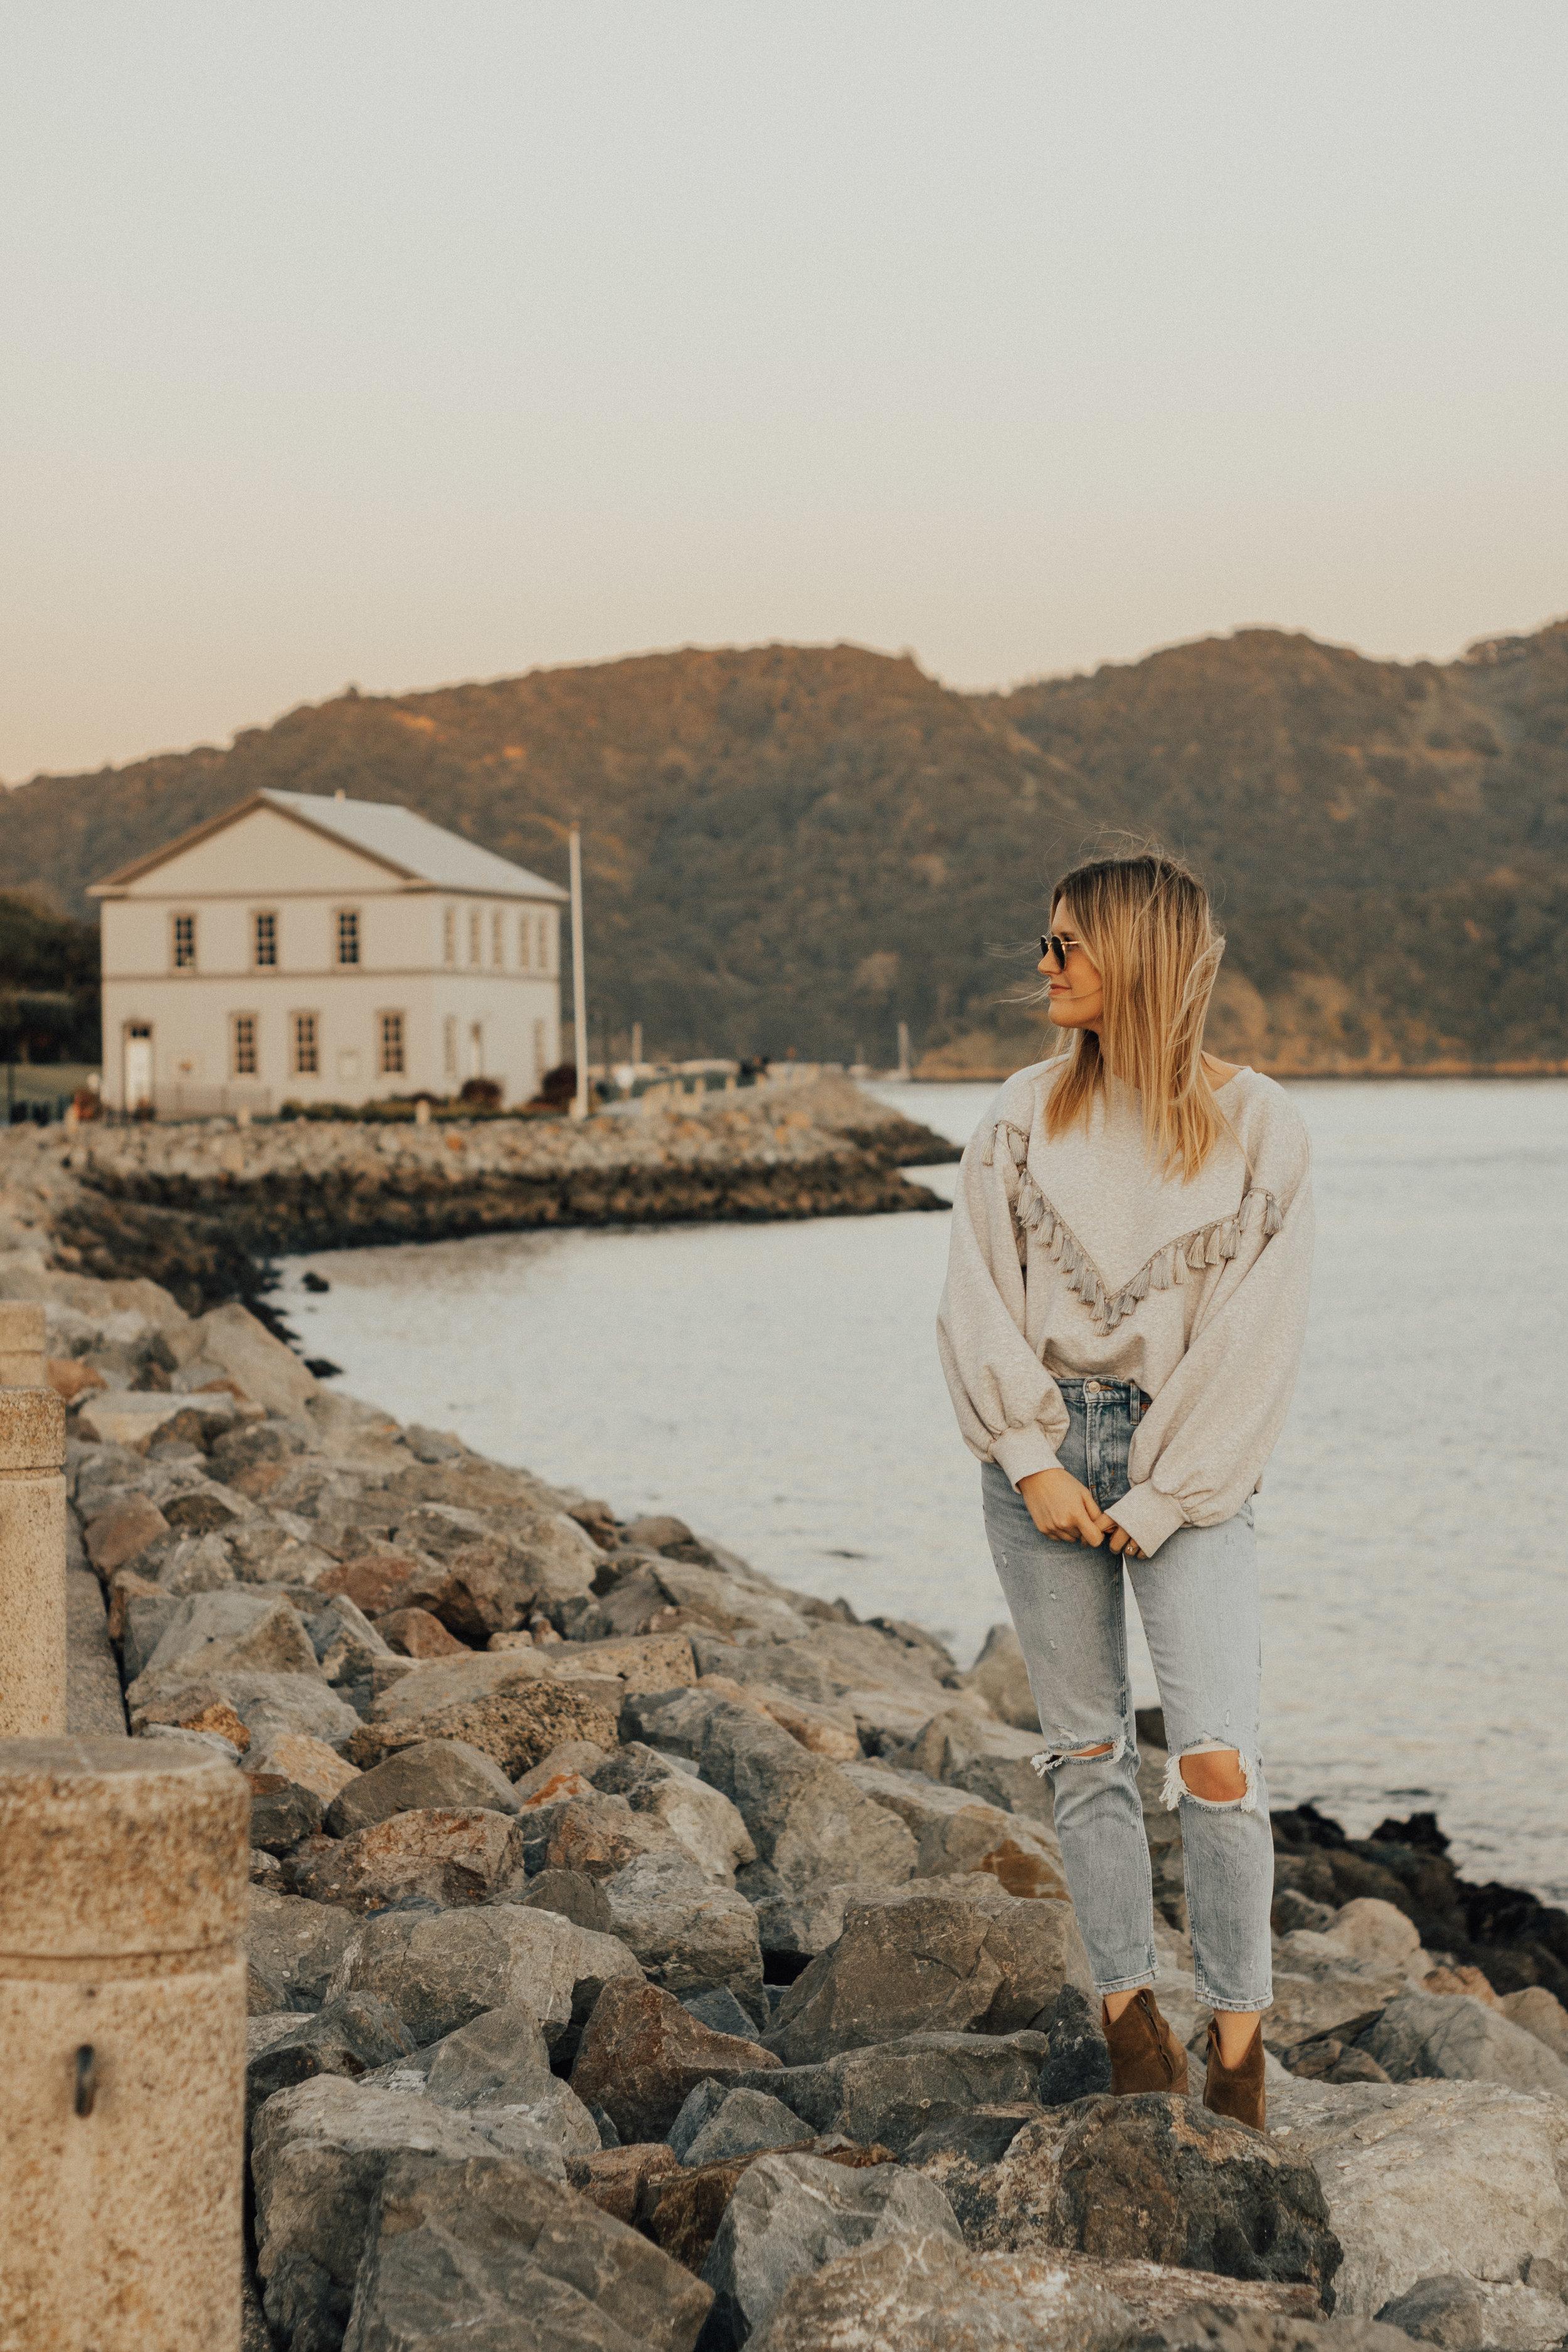 hm-gray-tassel-sweatshirt-21.jpg